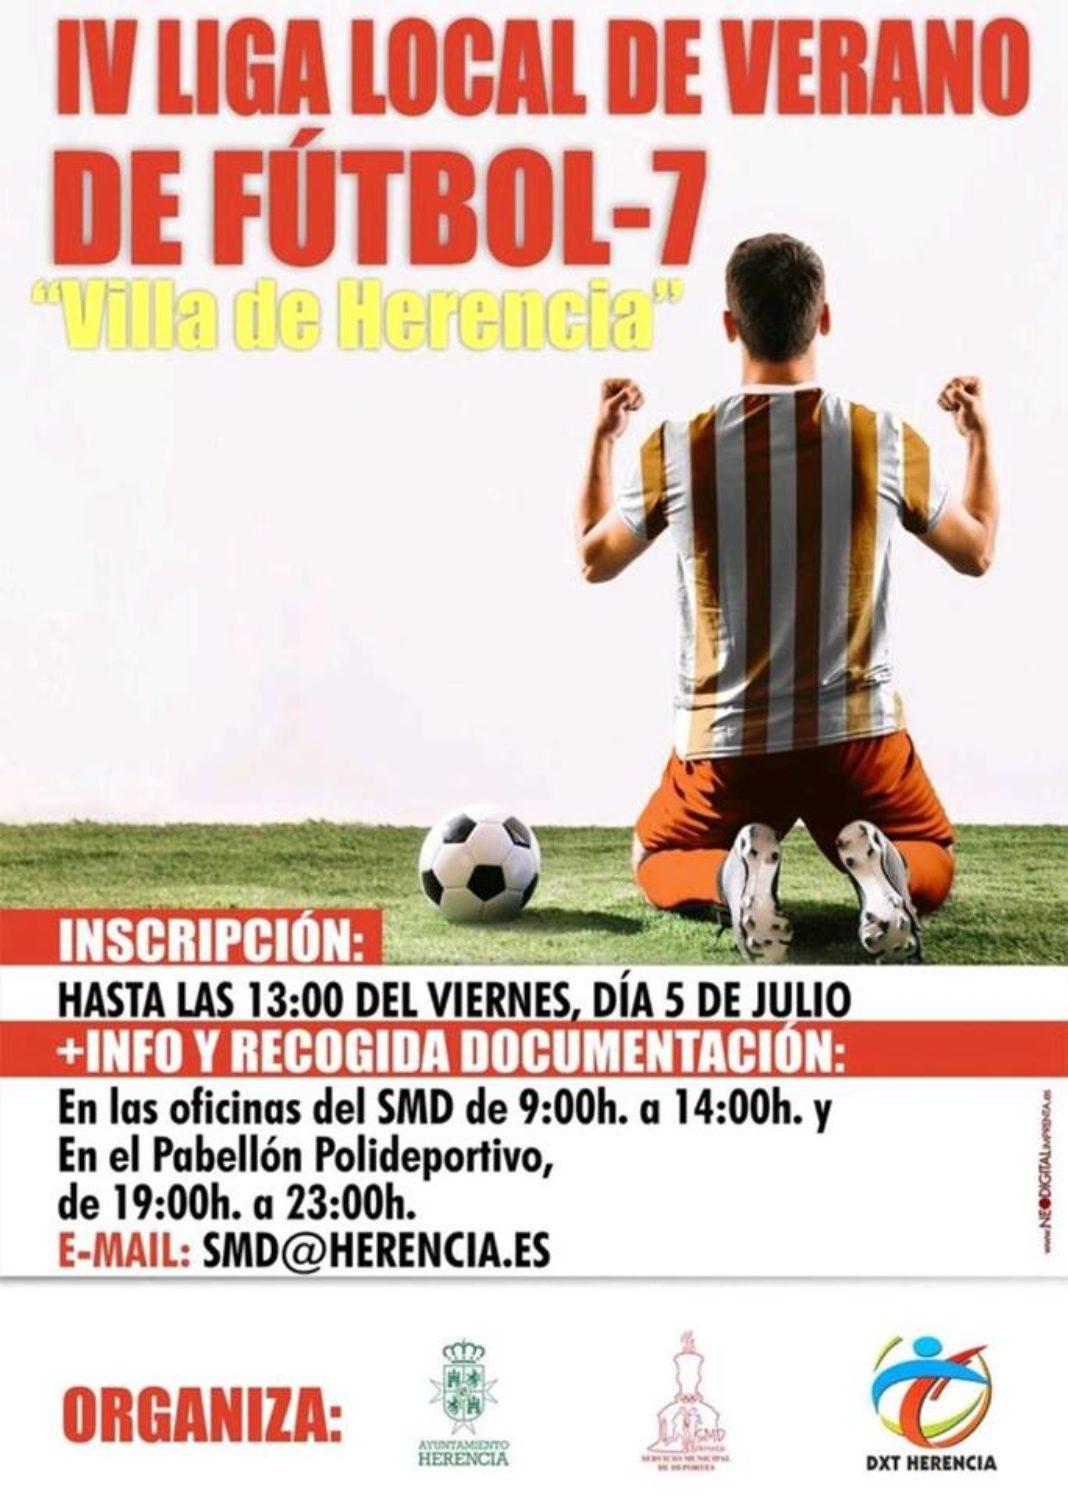 liga local de verano de fútbol 7 en herencia 1068x1499 - Cuarta liga local de verano de fútbol 7 Villa de Herencia